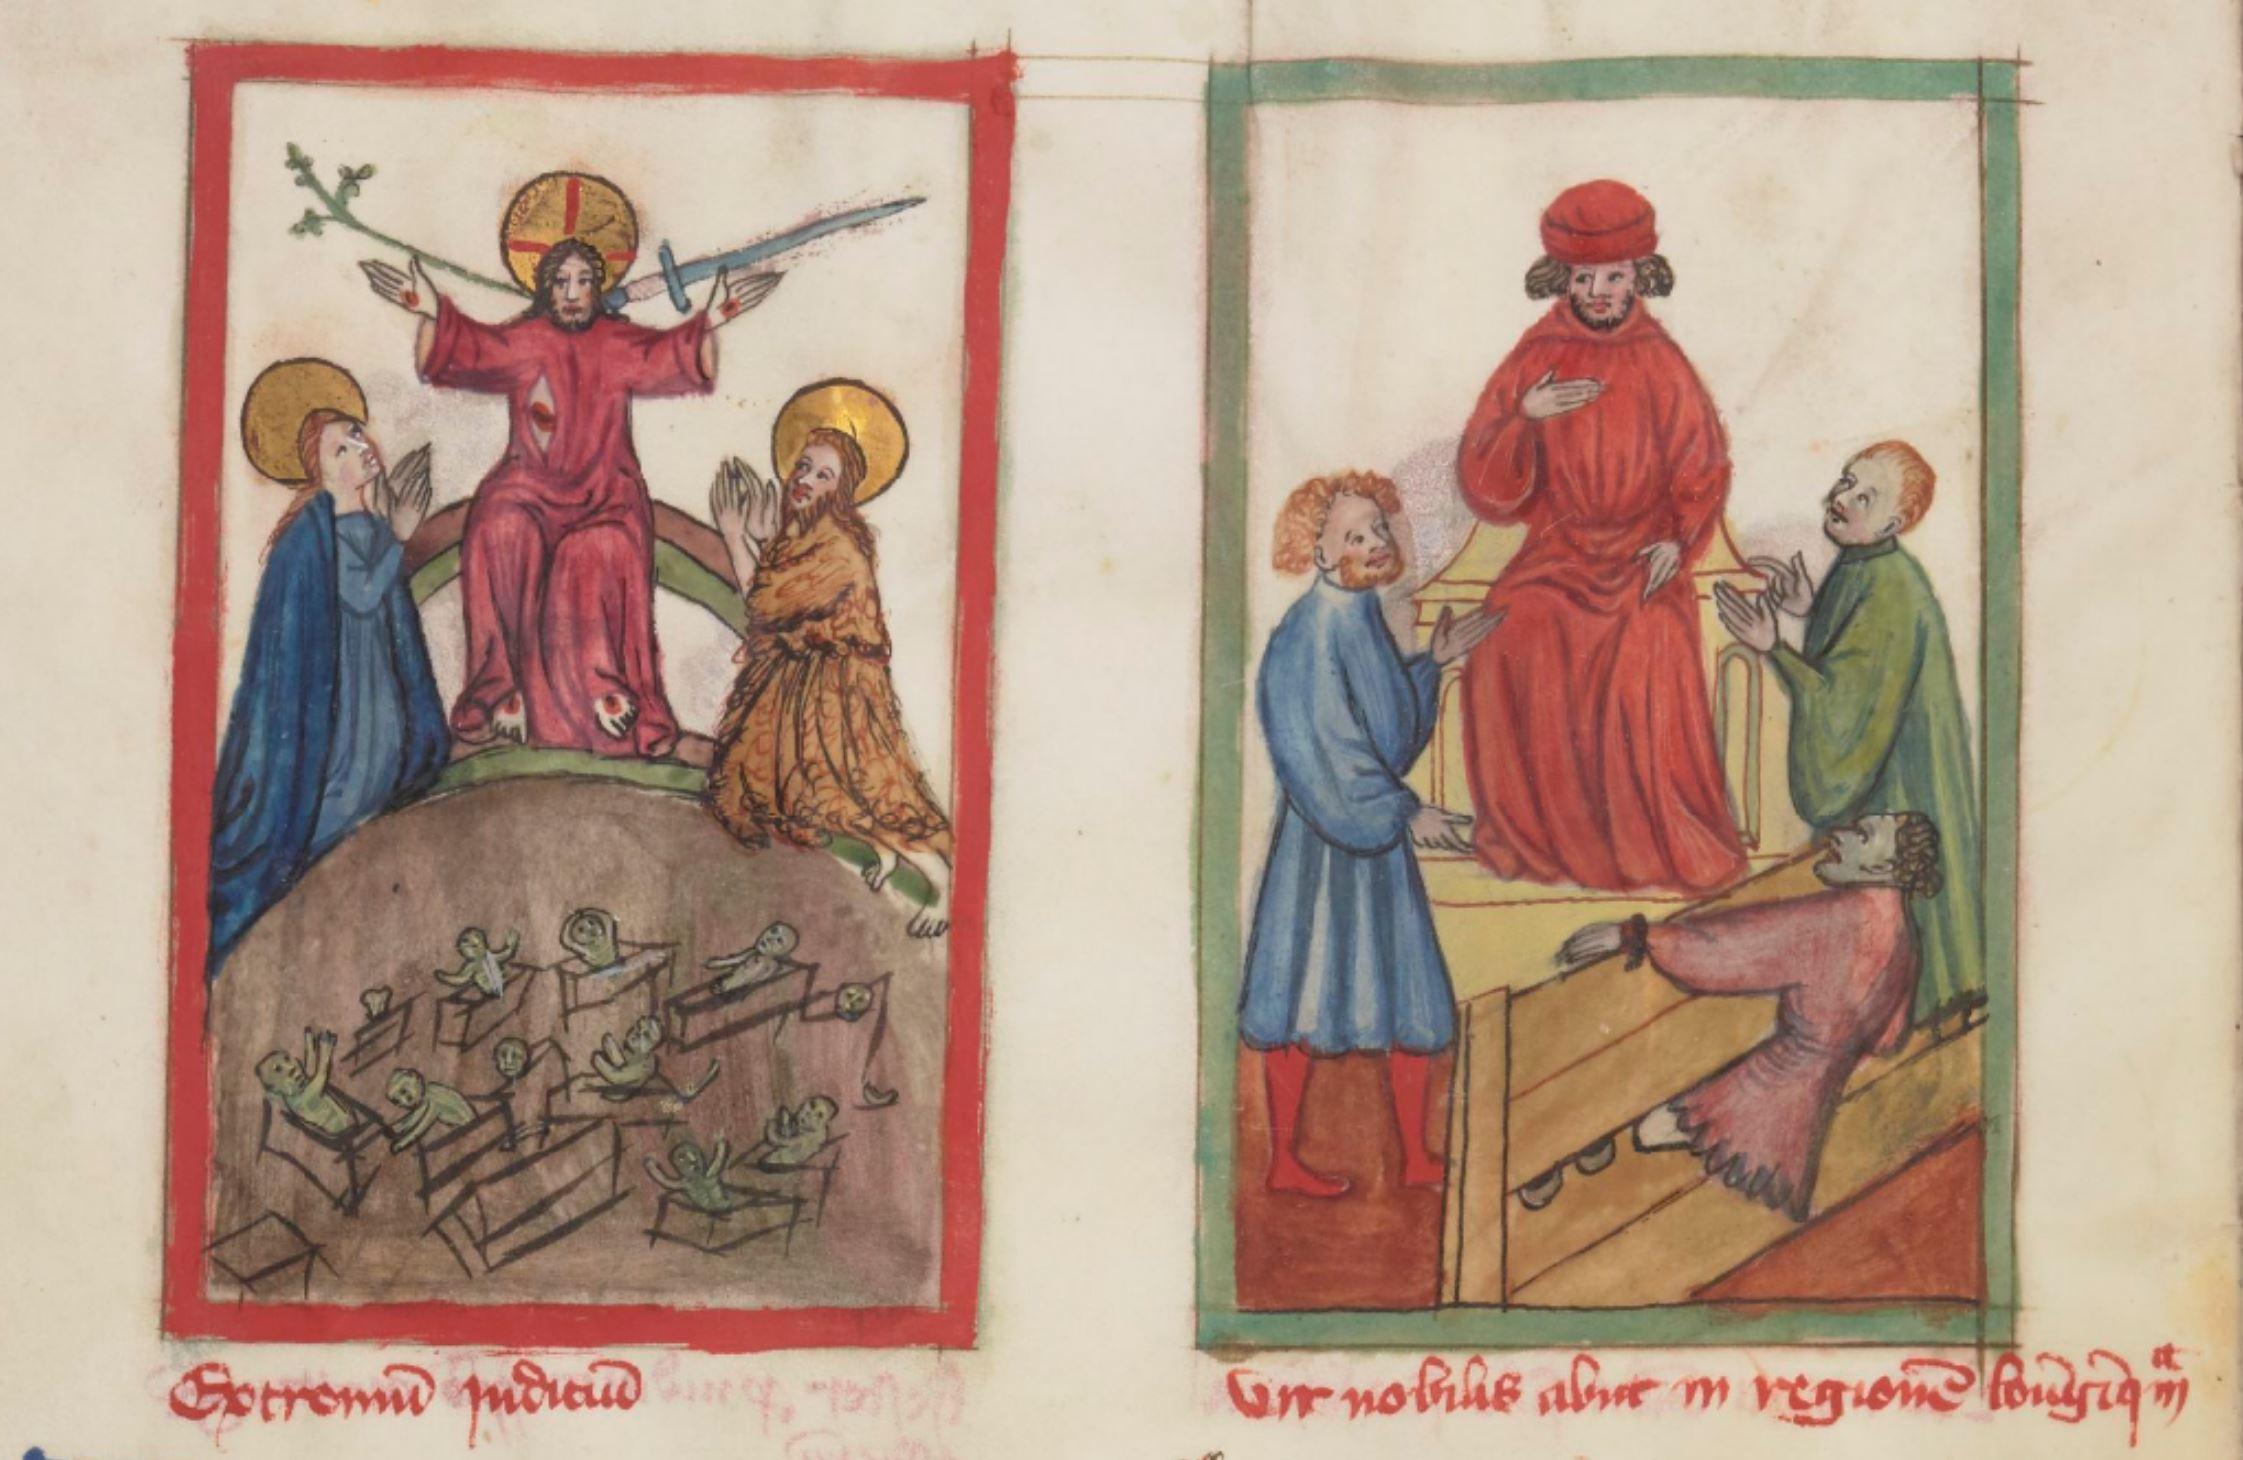 Speculum humanae salvationis, 1400-1450, BNF MS lat. 9585 fol 45v gallica